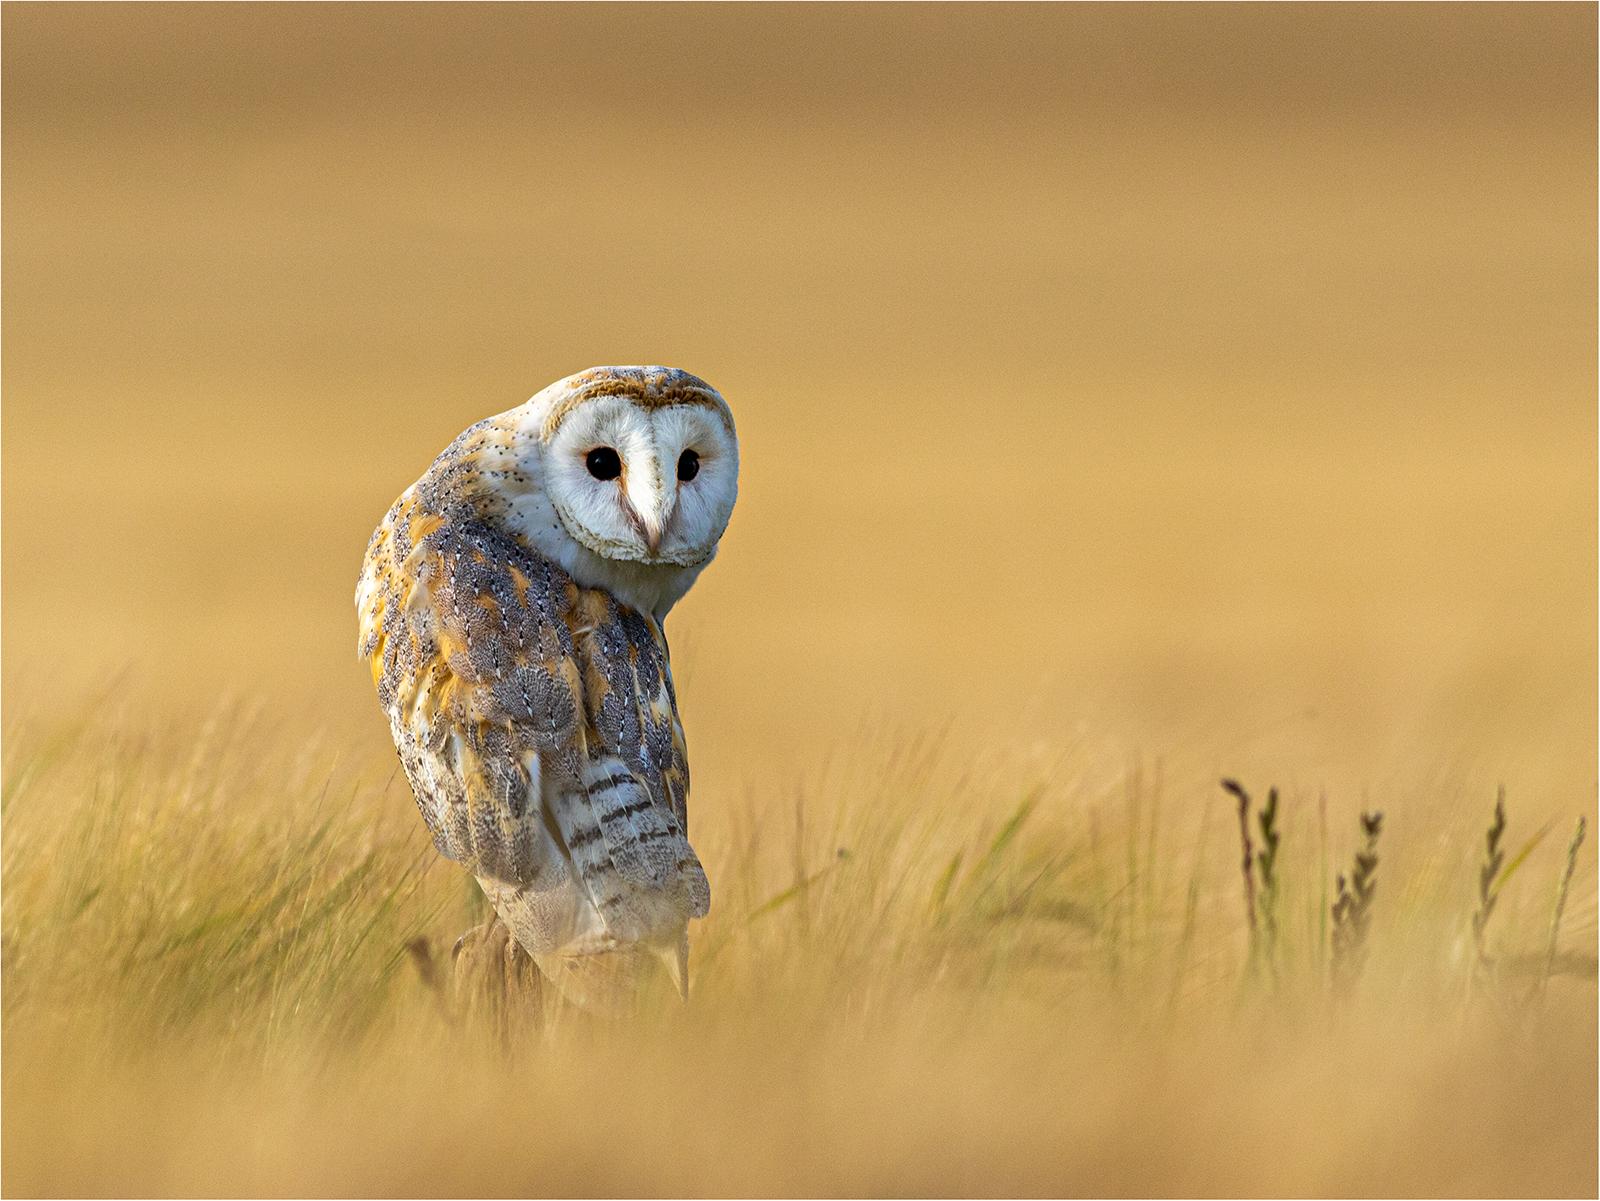 Barn_Owl%255B1%255D.jpg